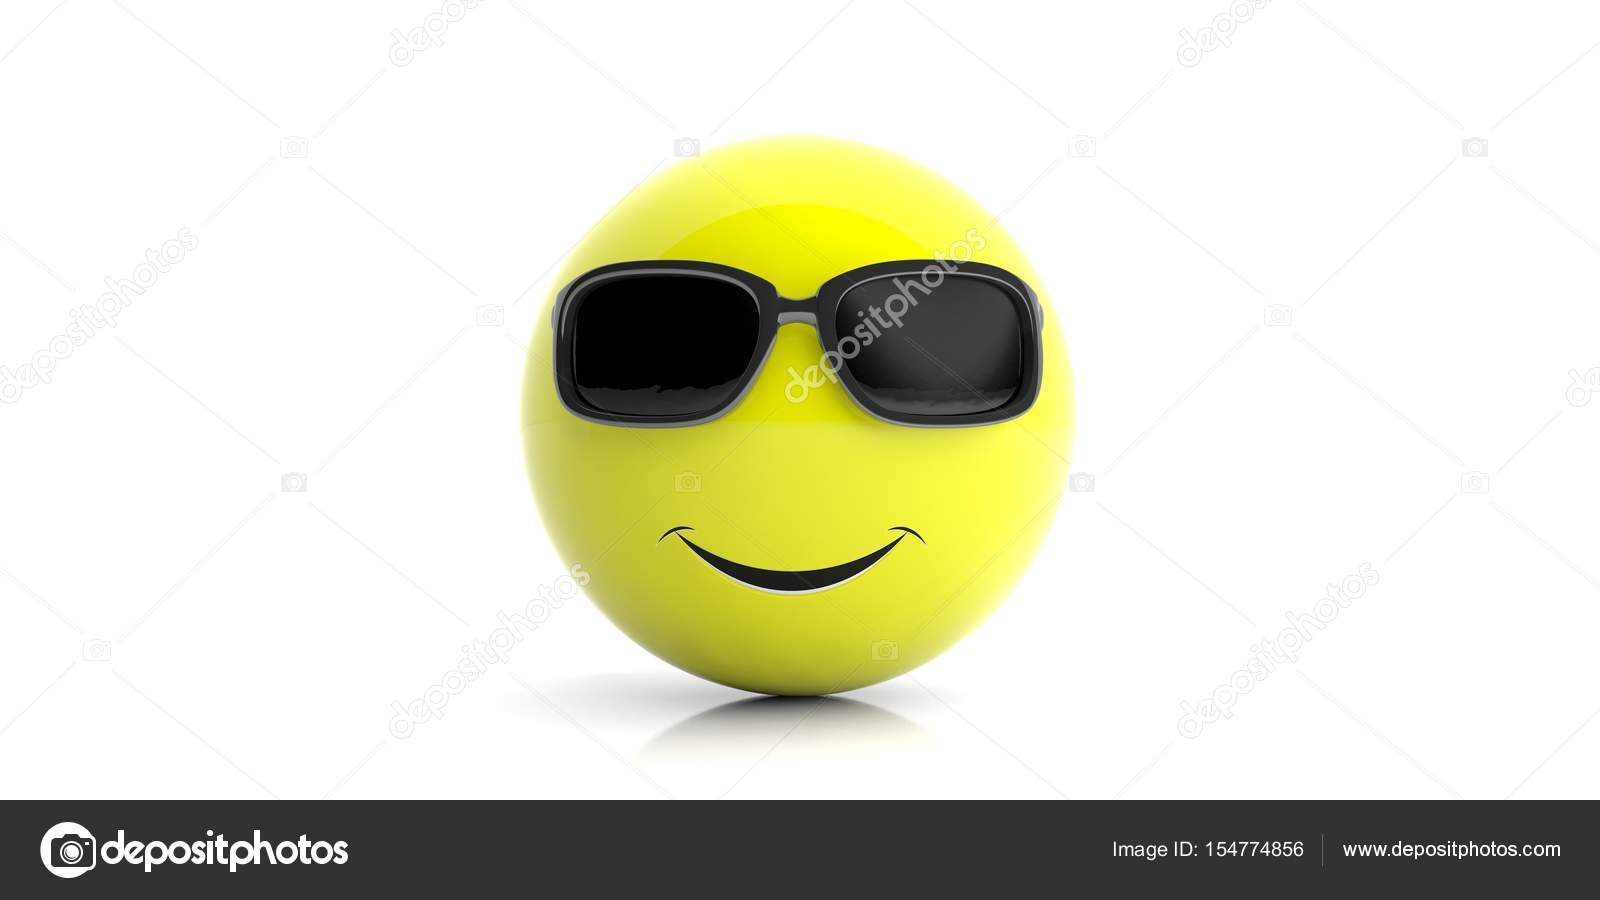 depositphotos 154774856 stock photo yellow smiling emoji with sunglasses